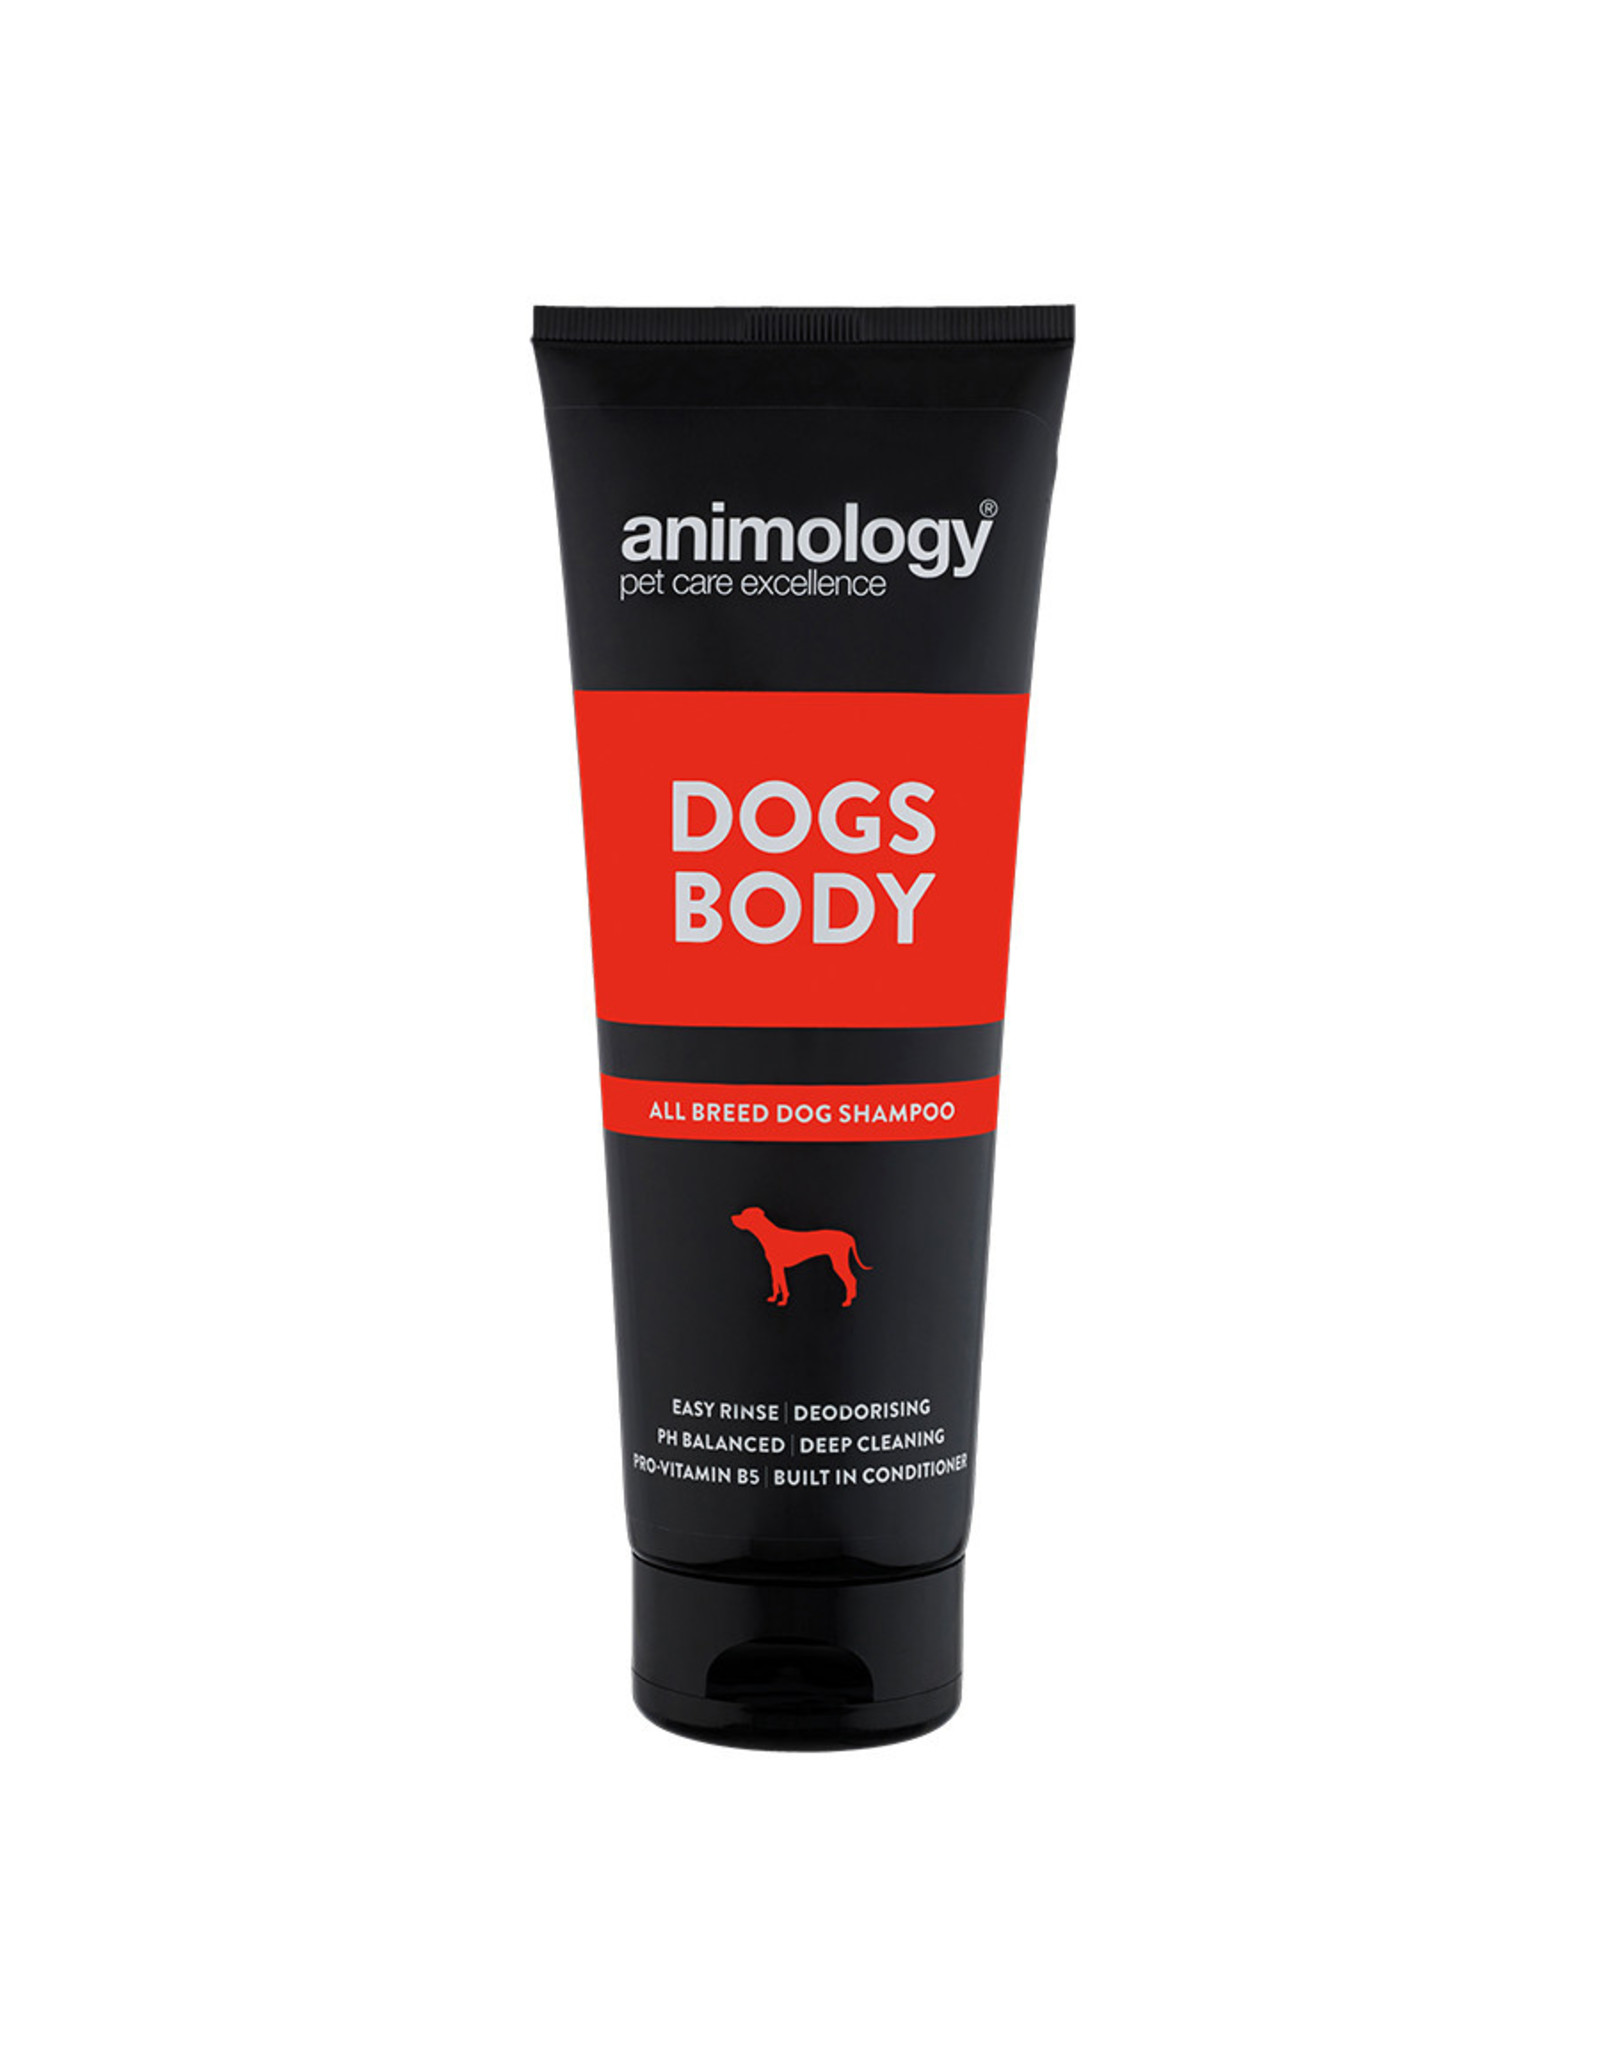 Animology Dogs Body Shampoo, 250ml